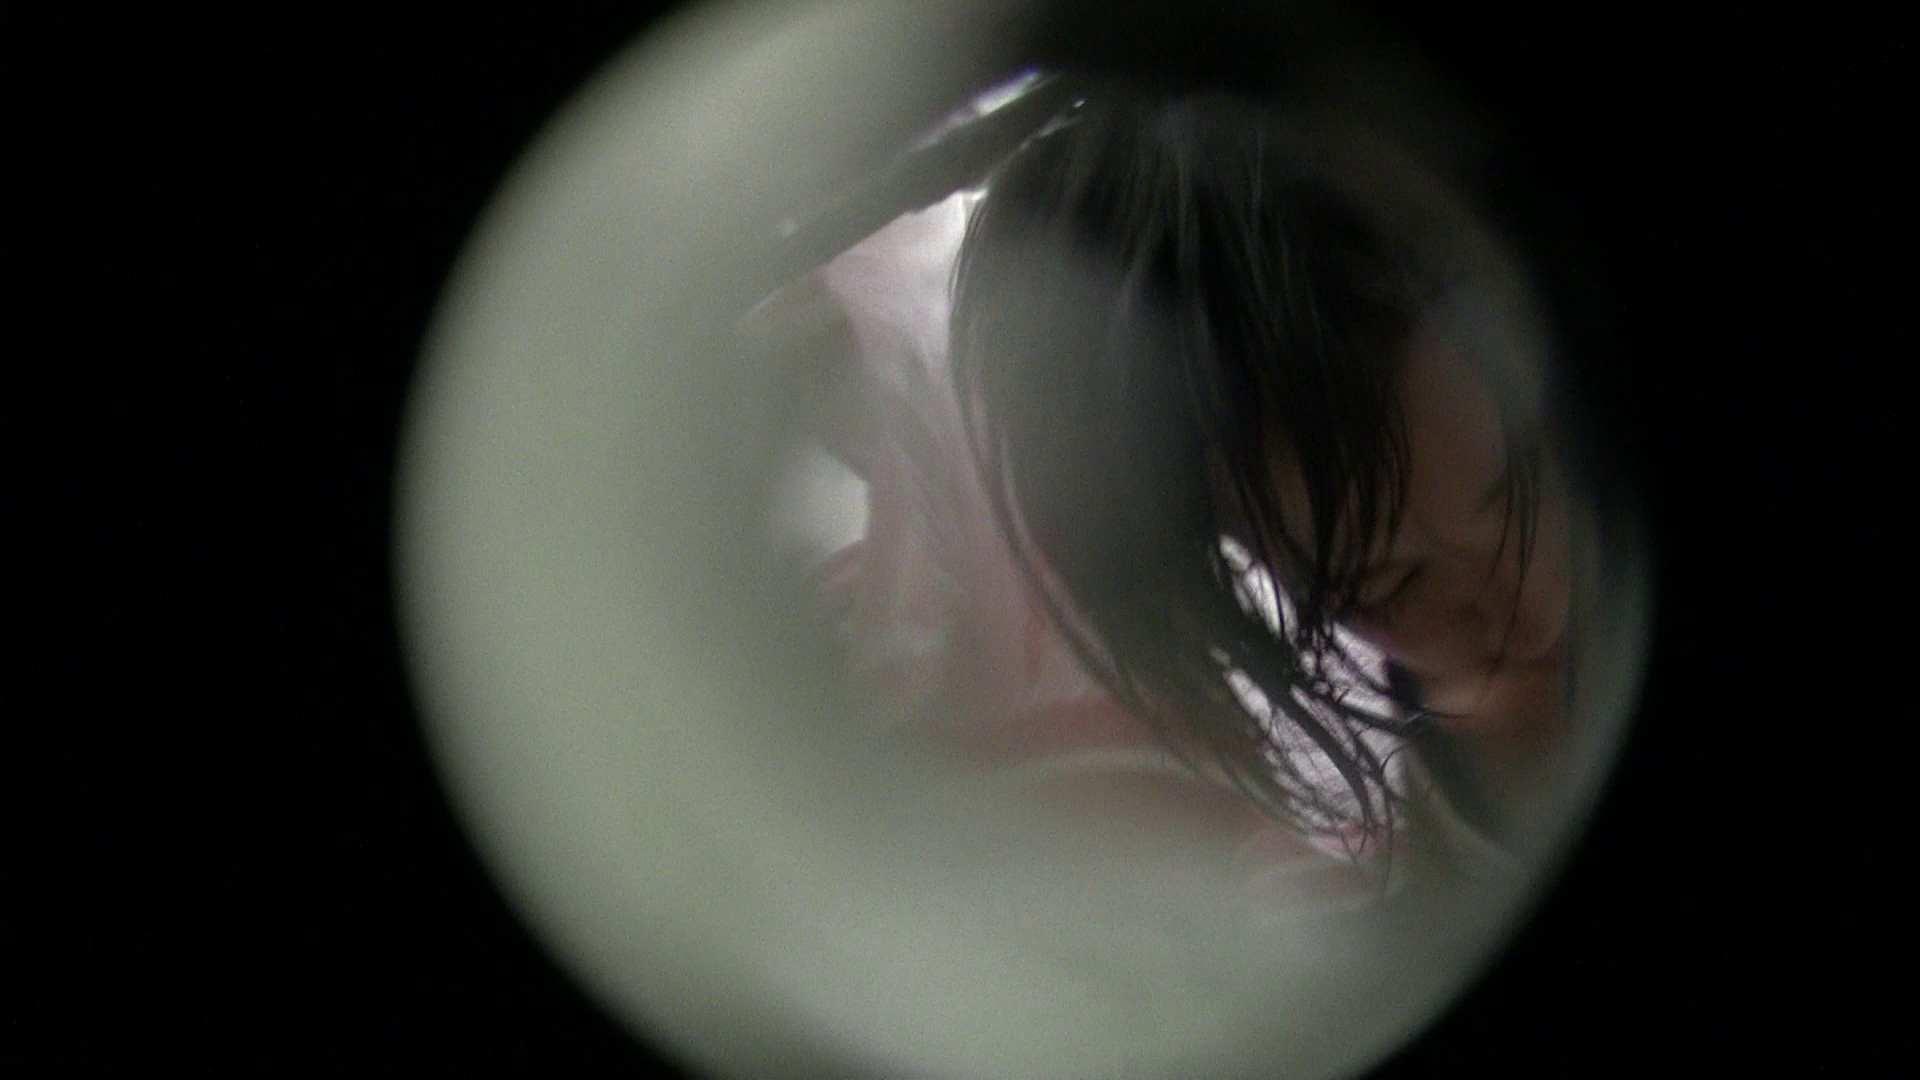 NO.23 色白巨乳嬢×2 巨乳 すけべAV動画紹介 81pic 6